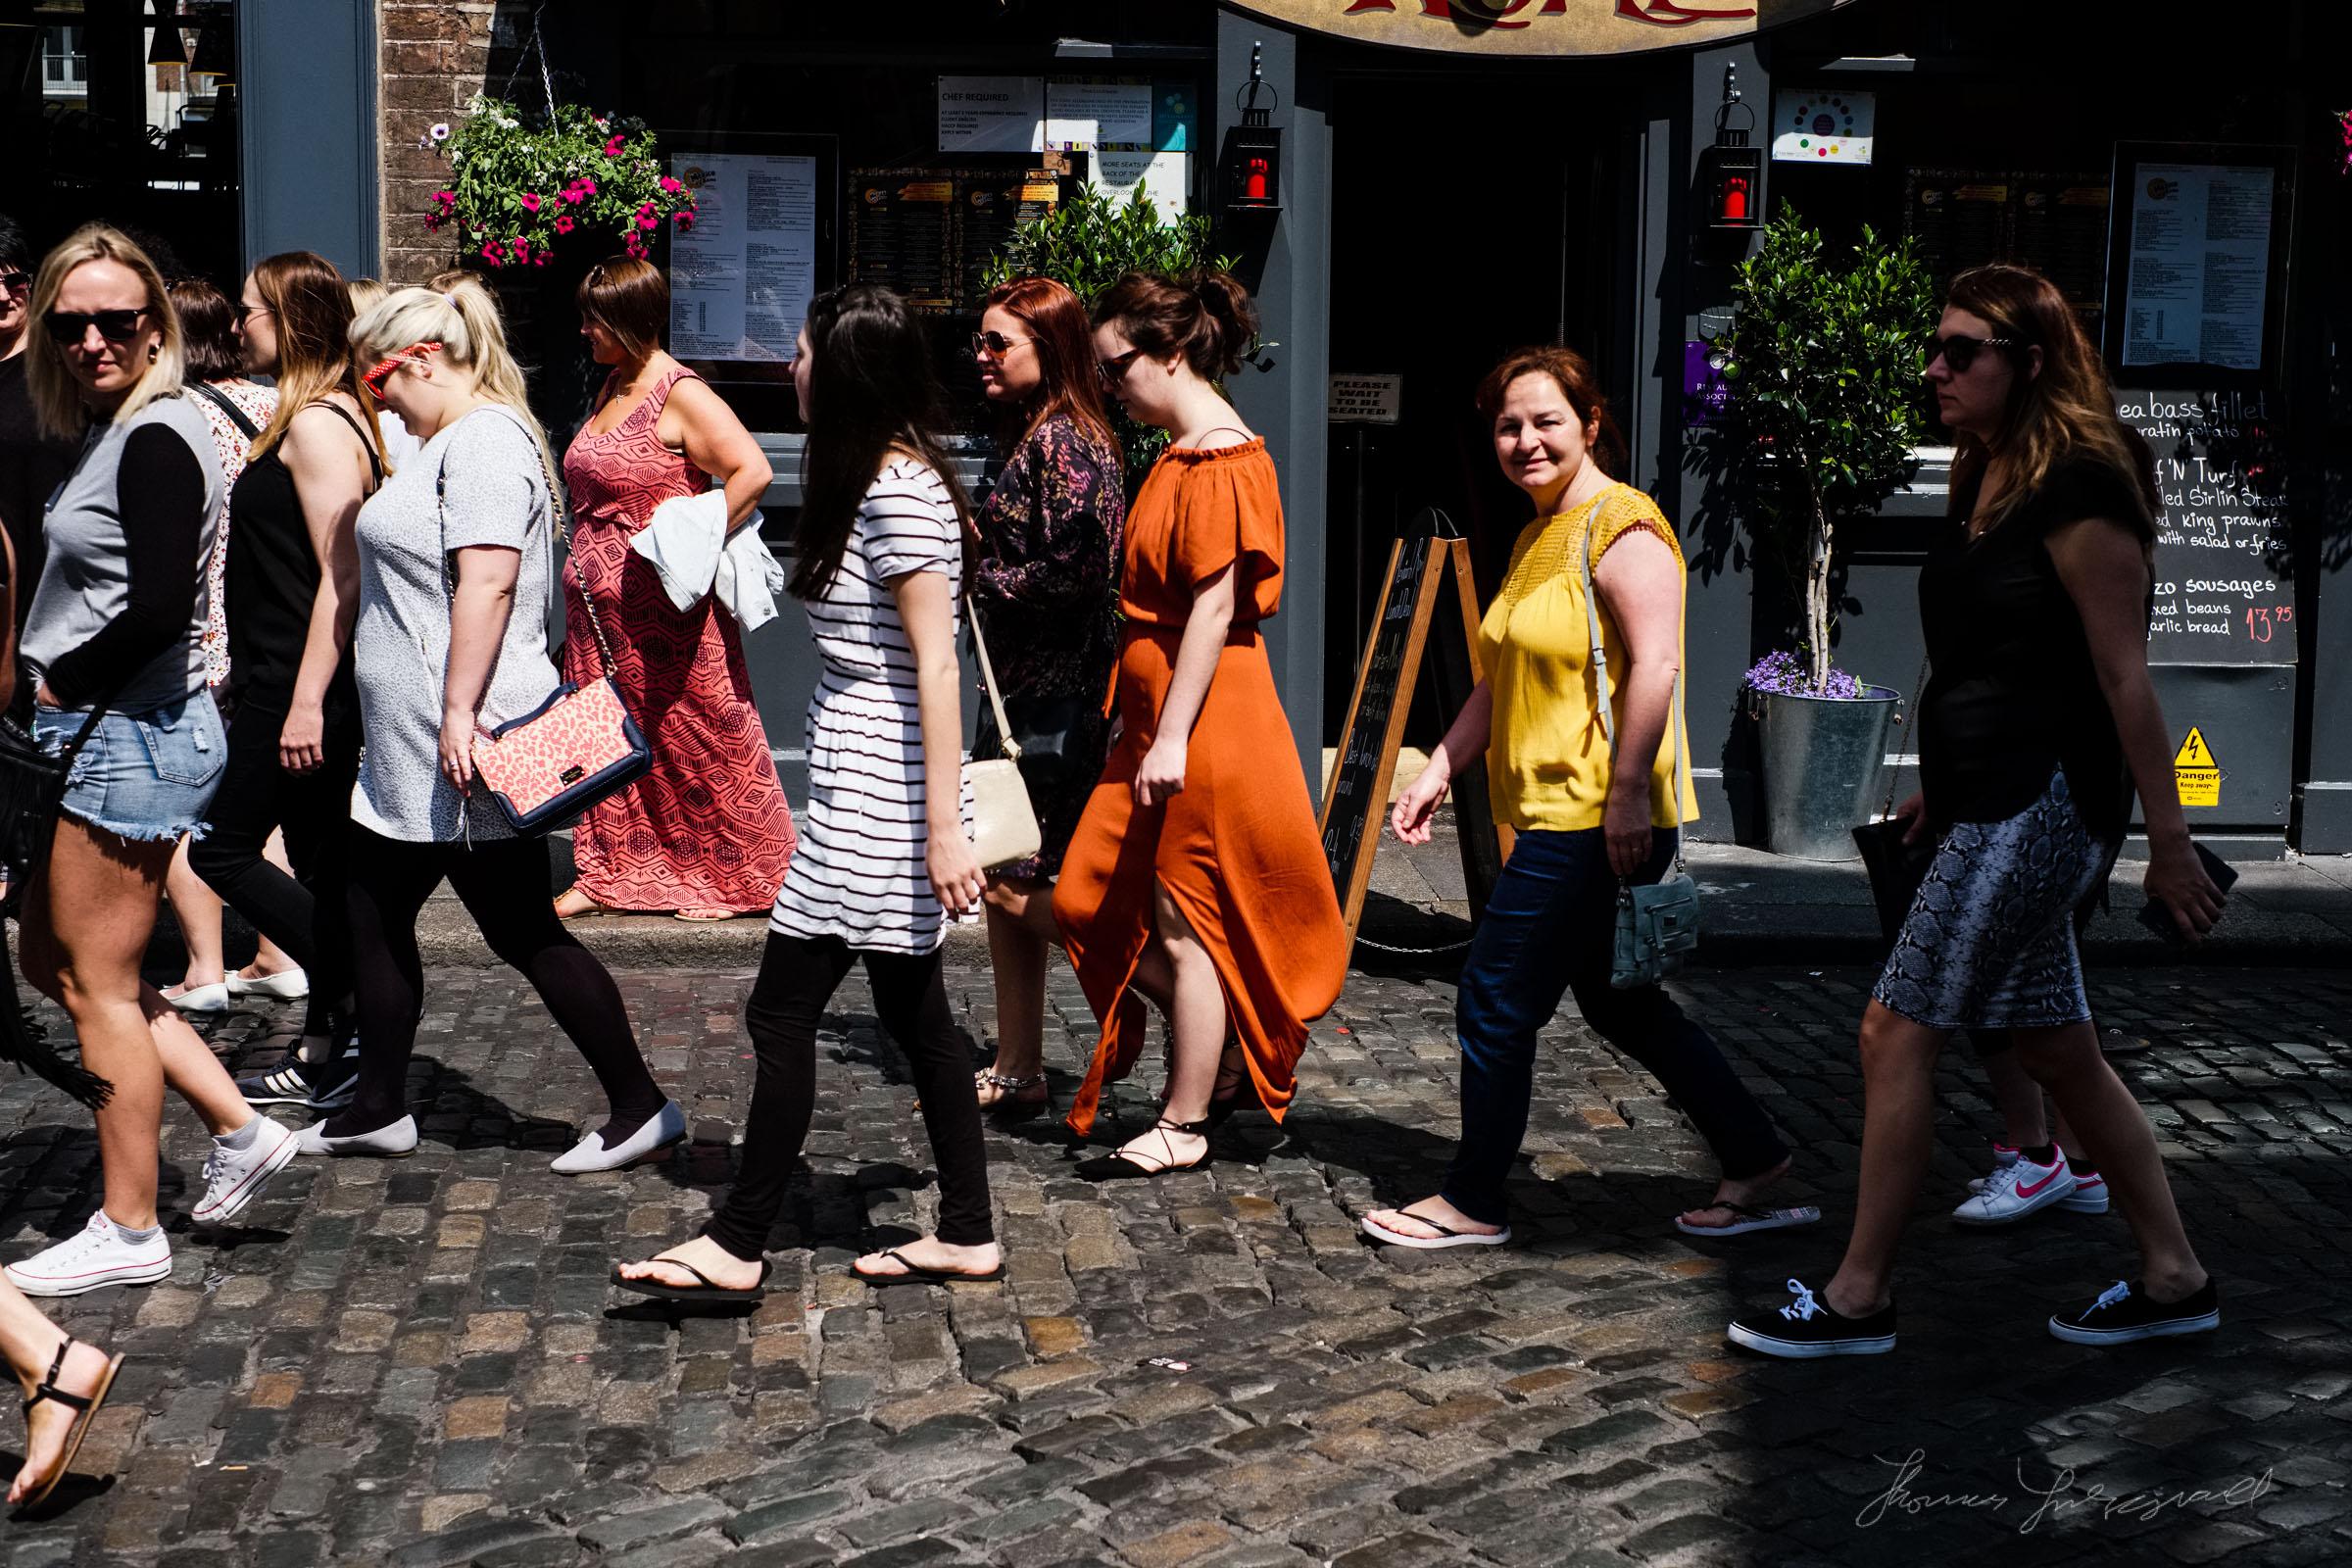 Street-Photo-Diary-Issue-16-31.jpg